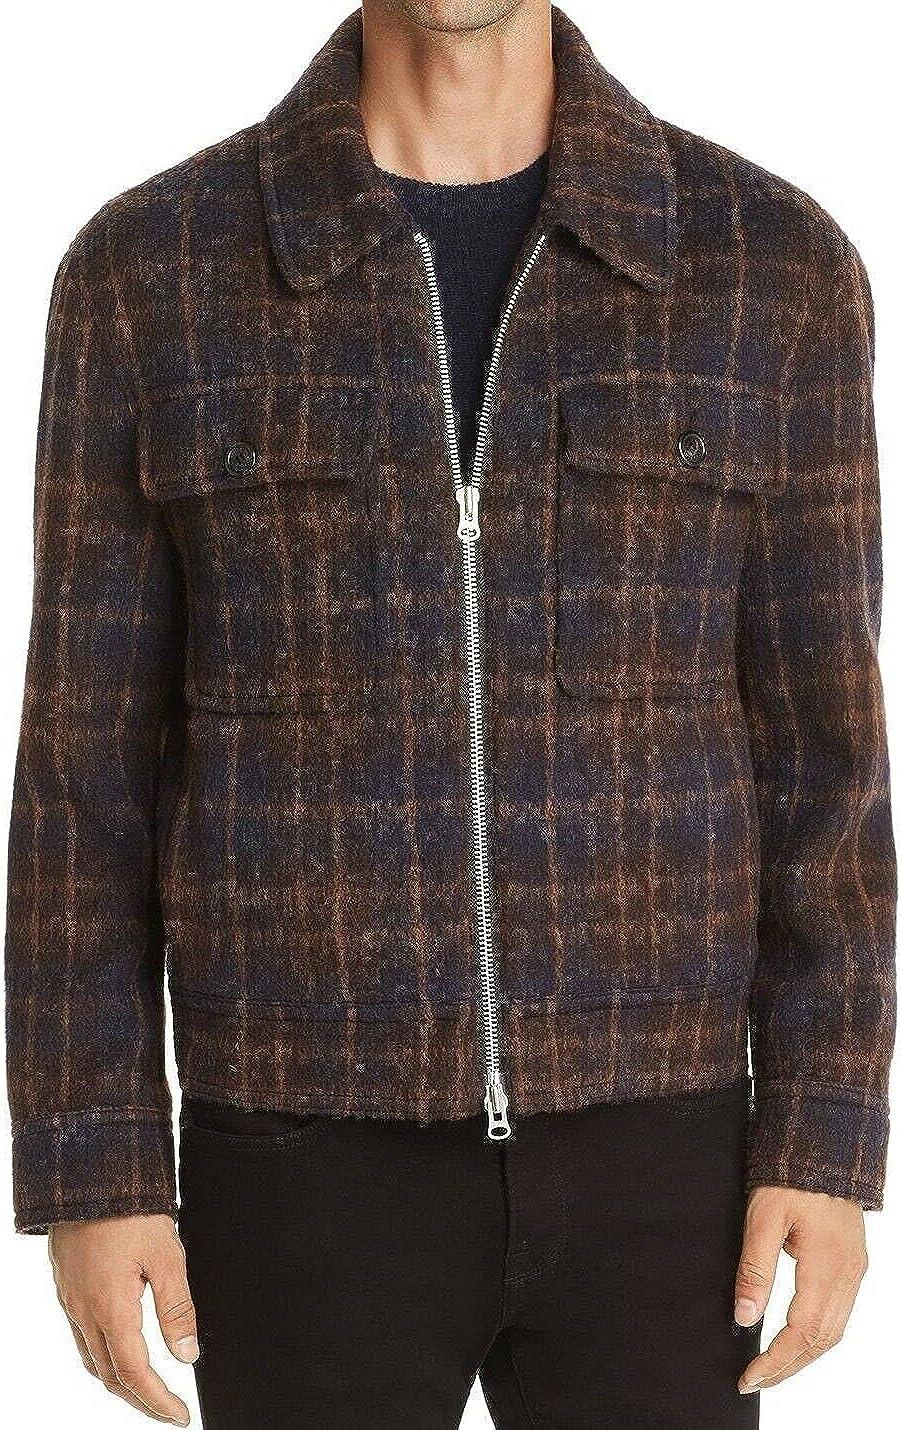 Andersson Bell NAVY BROWN Plaid Large Zip discharge sale Sale Jacket US